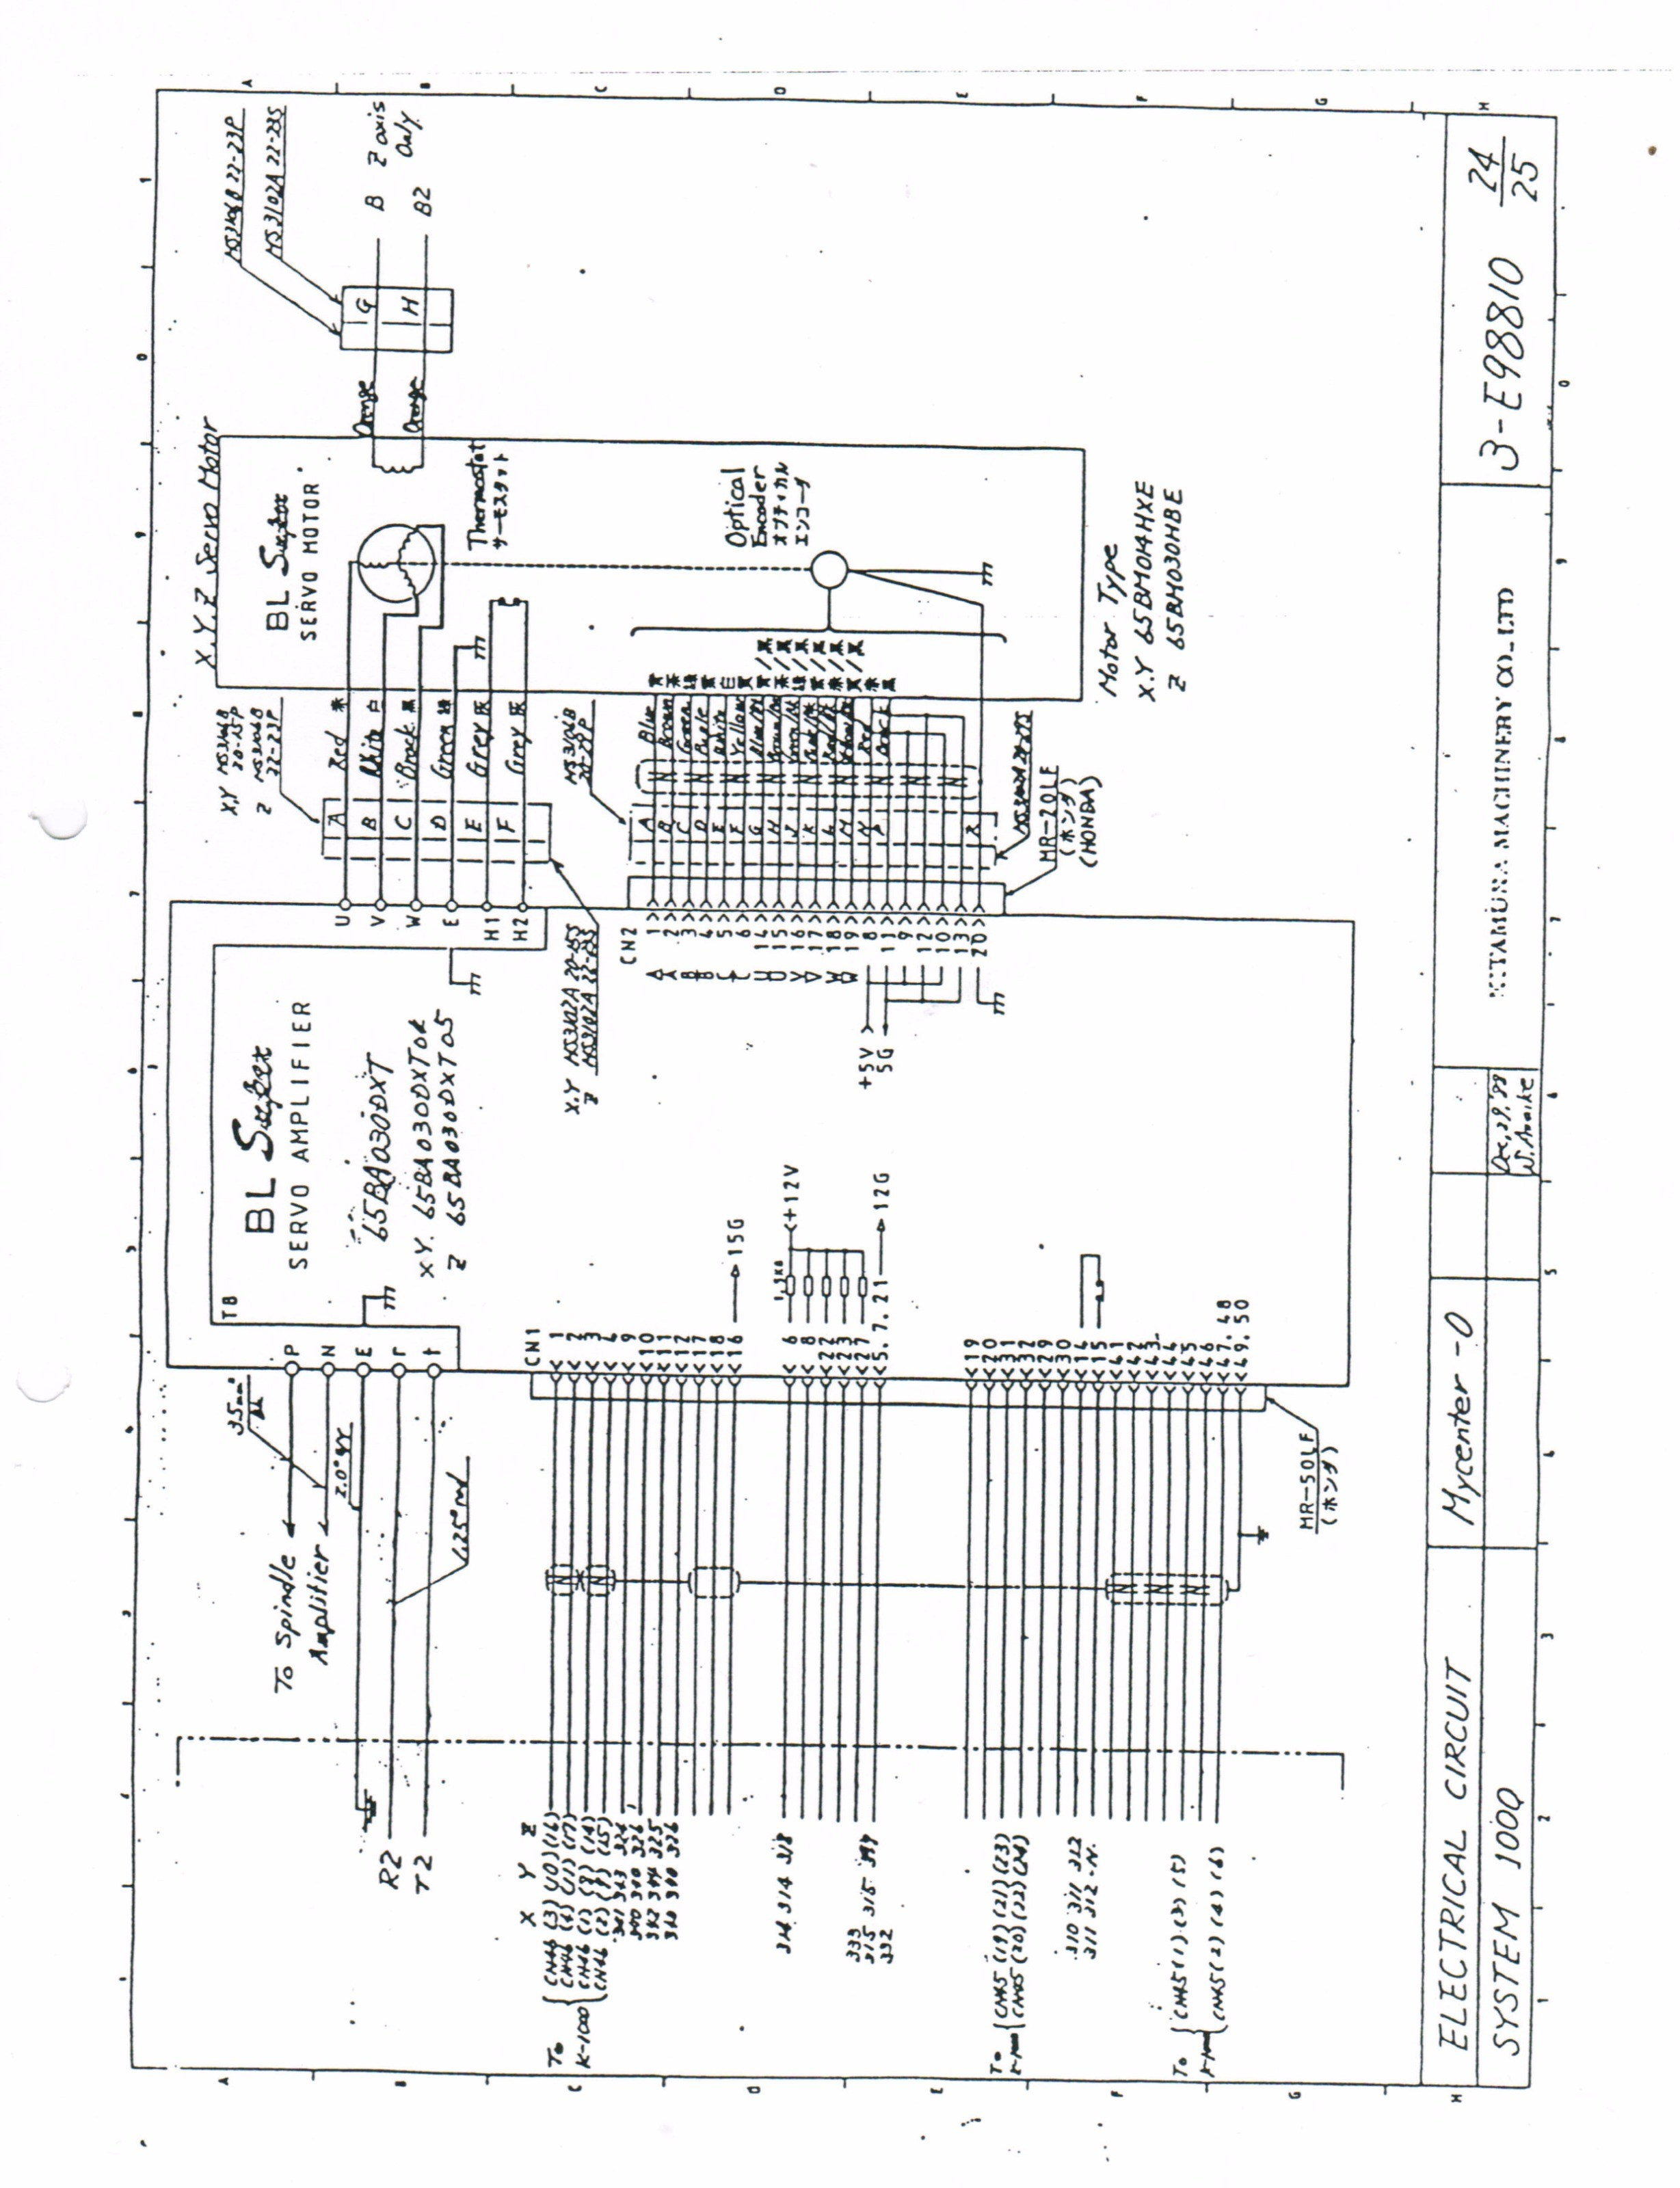 Amazing Mesa 7I77 Cnc Wire Diagram Auto Electrical Wiring Diagram Wiring Cloud Mousmenurrecoveryedborg